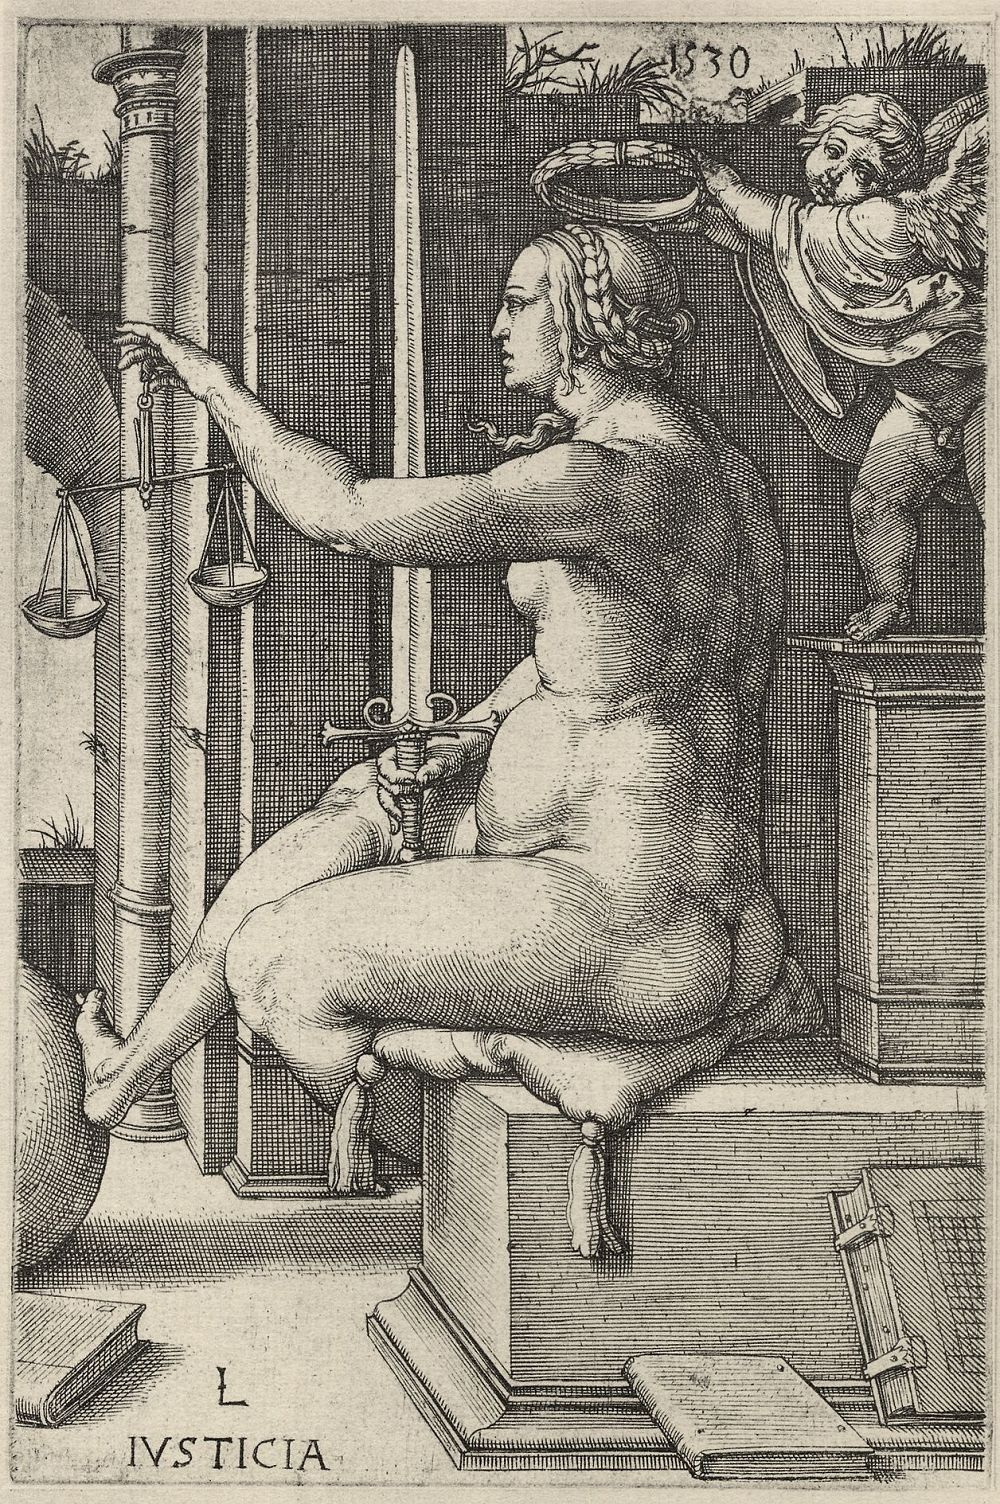 "Lucas van Leiden (Luke of Leiden). A Series Of""Virtues"" - Justice"